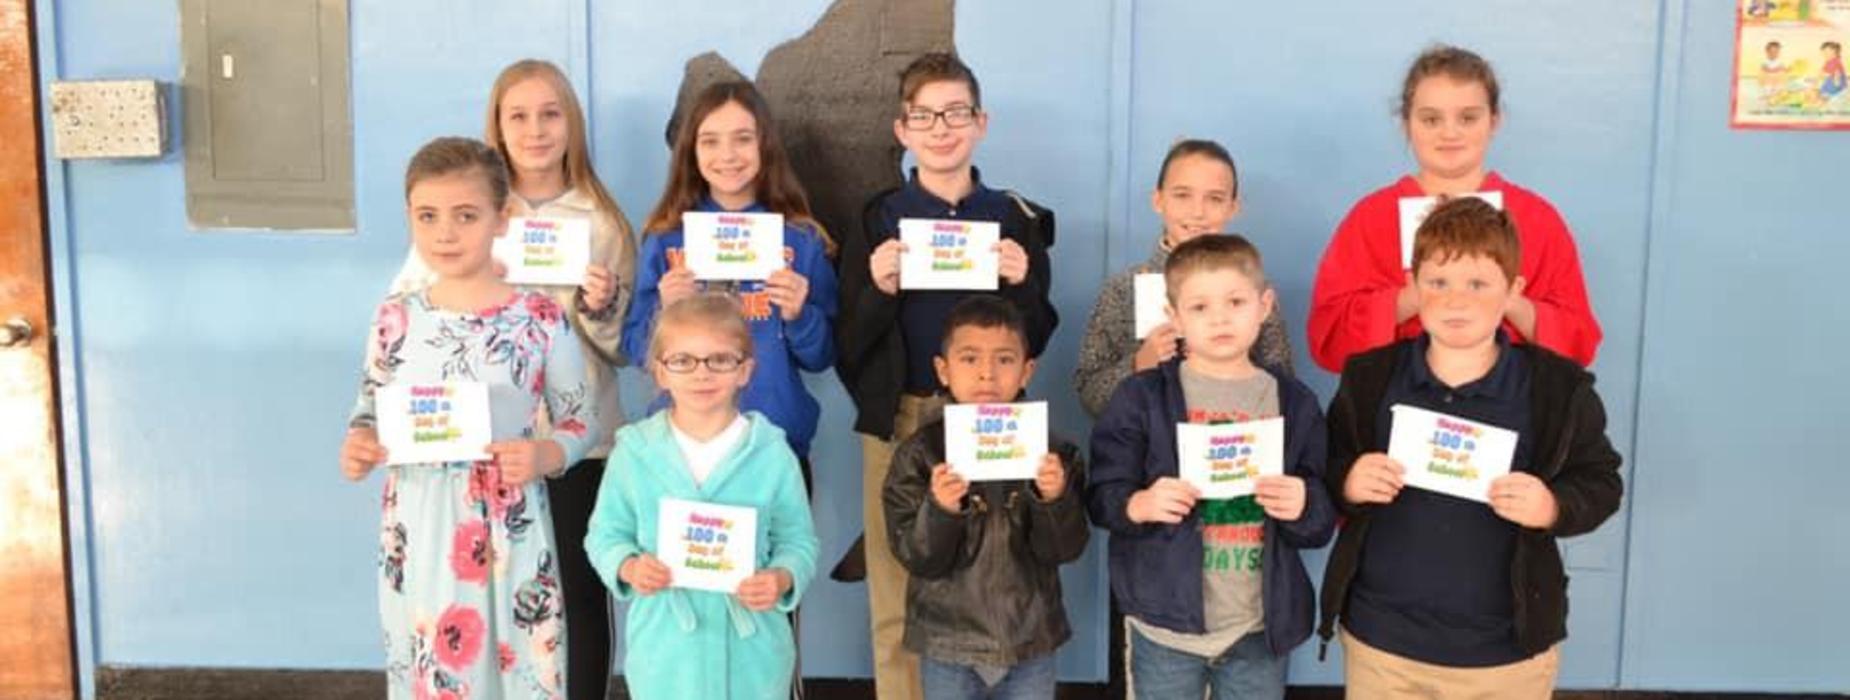 100th Day of School Winners